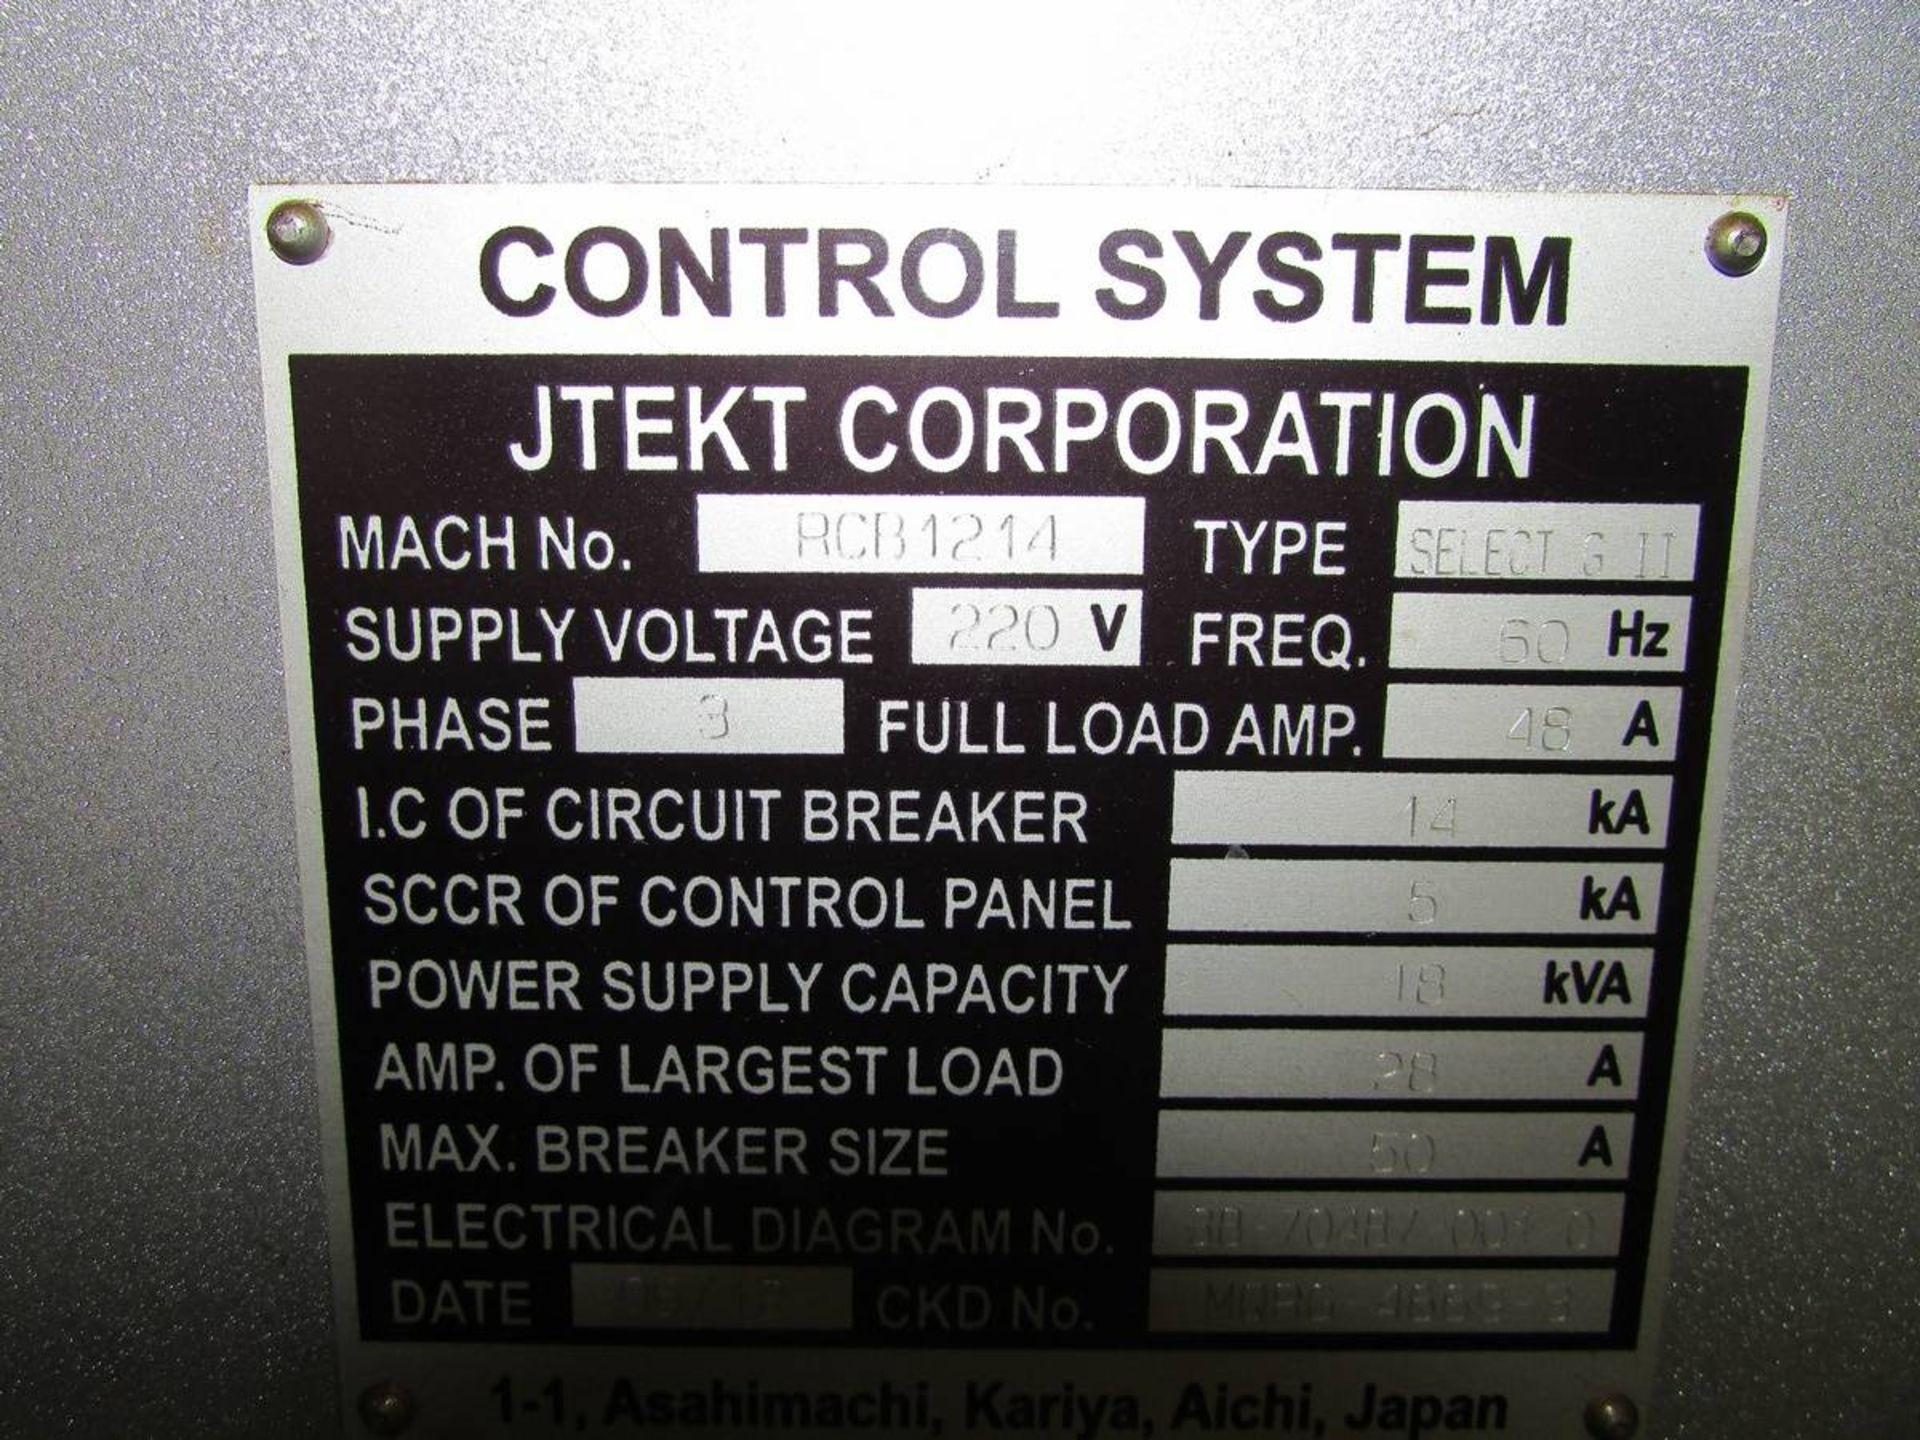 2012 Toyoda/ JTEKT 45m Select G II CNC OD Cylindrical Grinder - Image 20 of 21